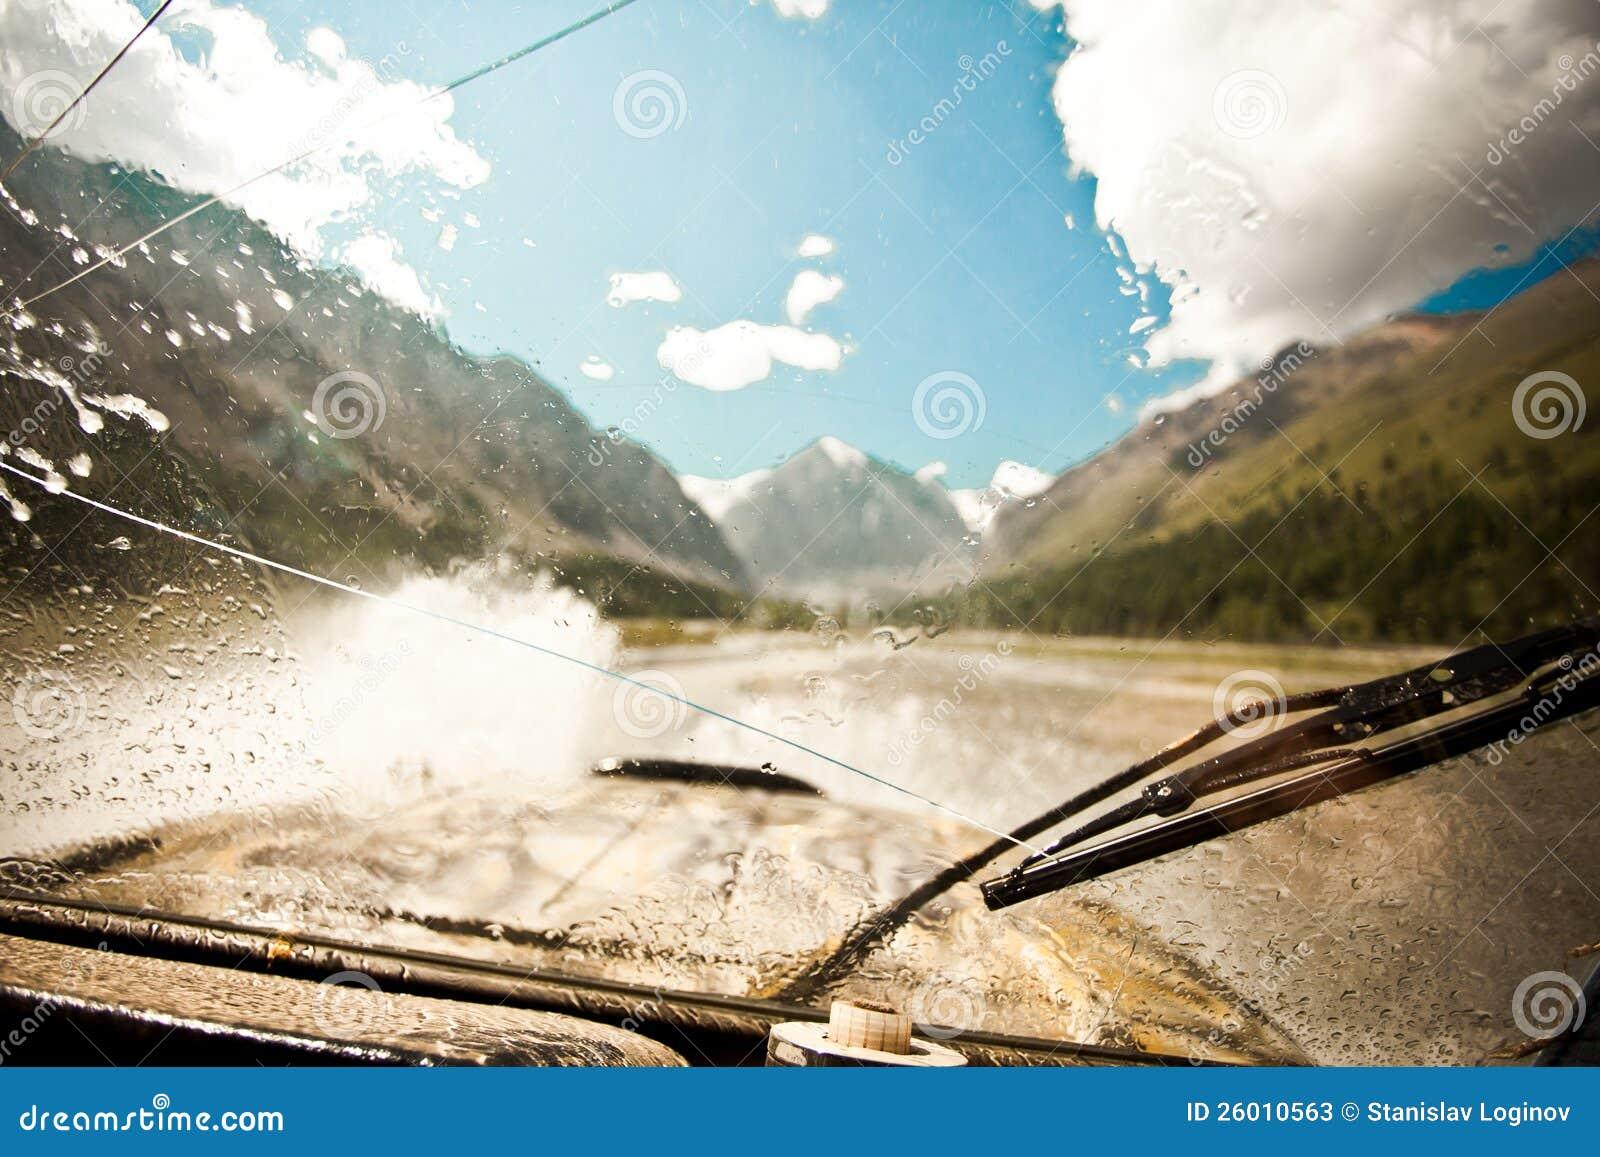 Wet Windshield Off Road Car